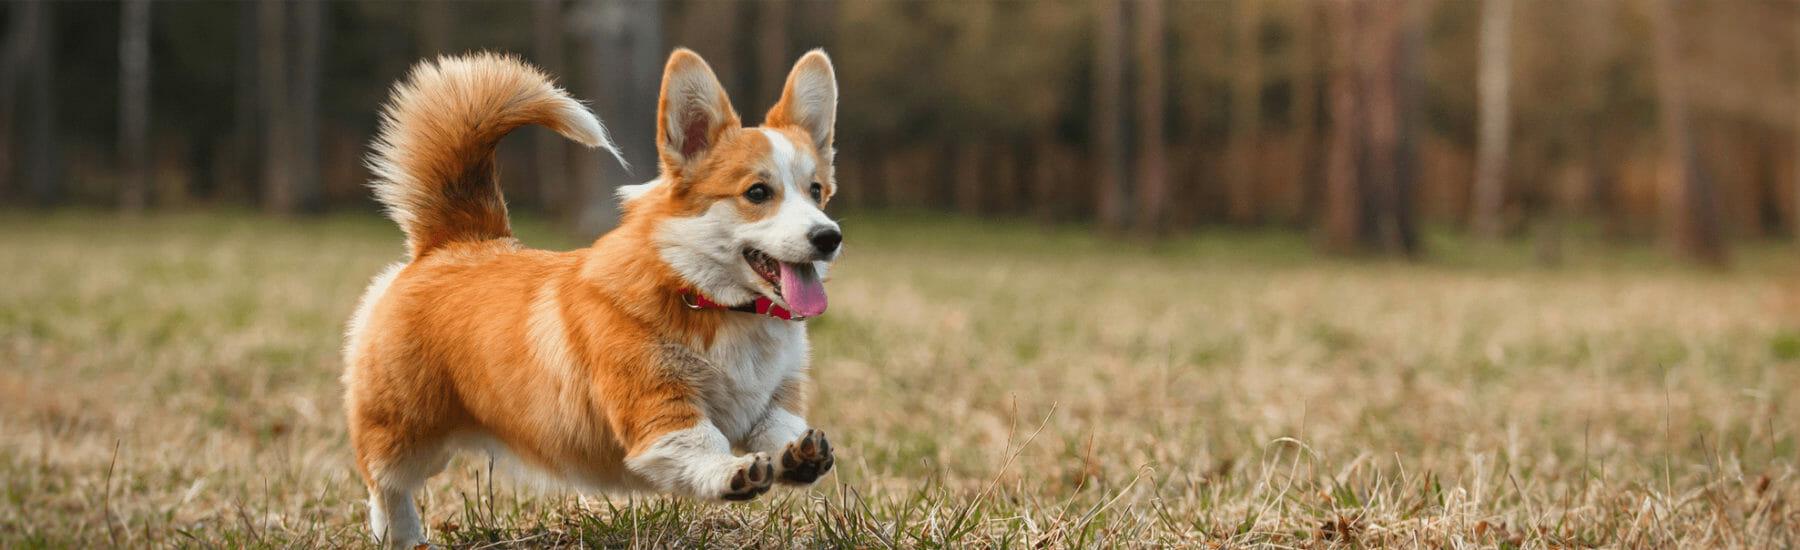 Orange dog jumping through the air